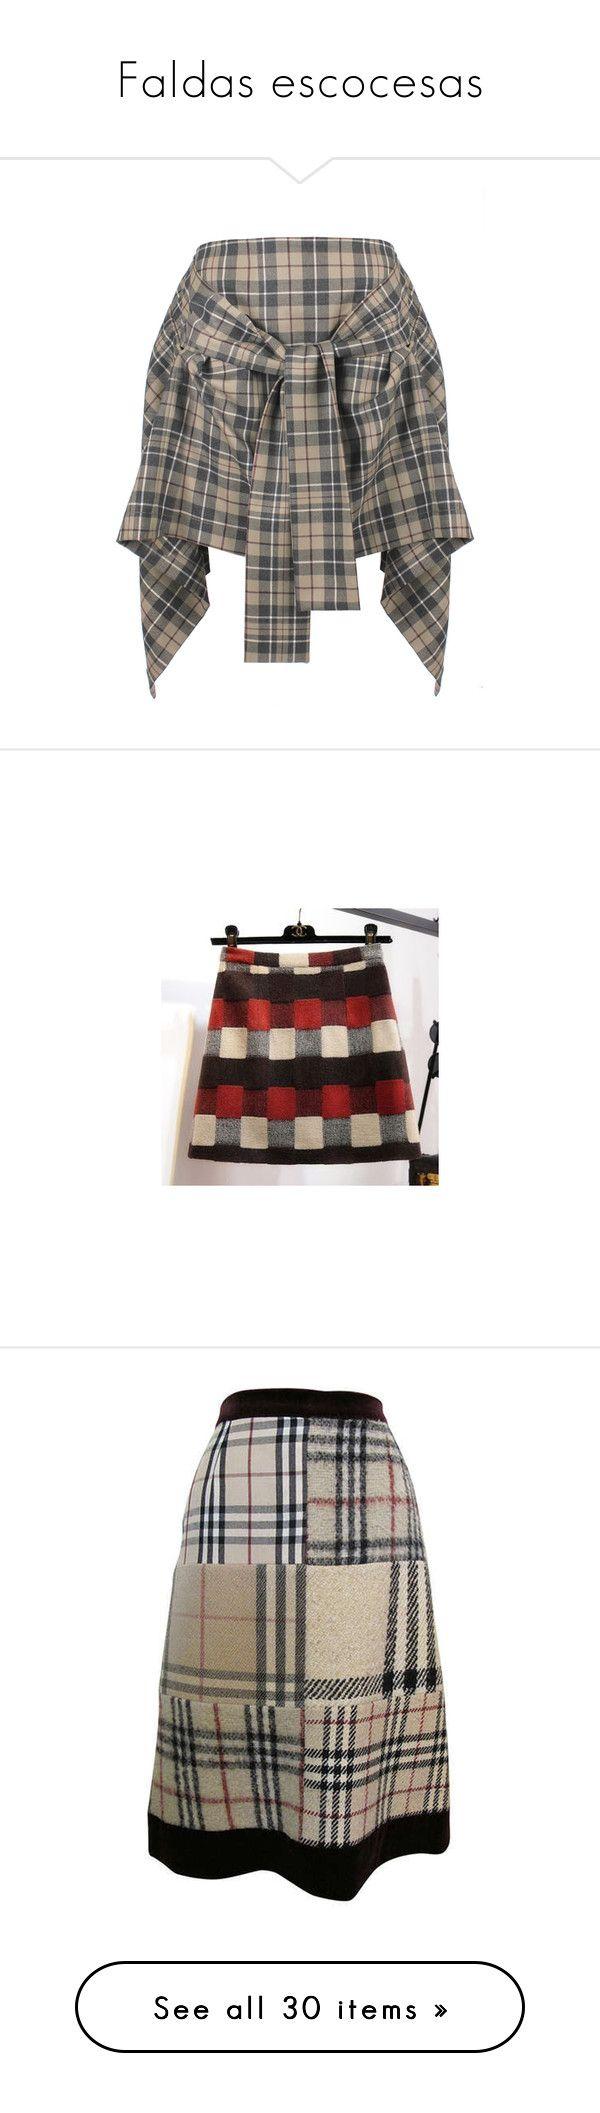 """Faldas escocesas"" by yblacasa on Polyvore featuring skirts, draped skirts, tie-dye skirt, plaid skirt, embellished skirts, vivienne westwood anglomania, mini skirts, women, short plaid skirt y green plaid mini skirt"